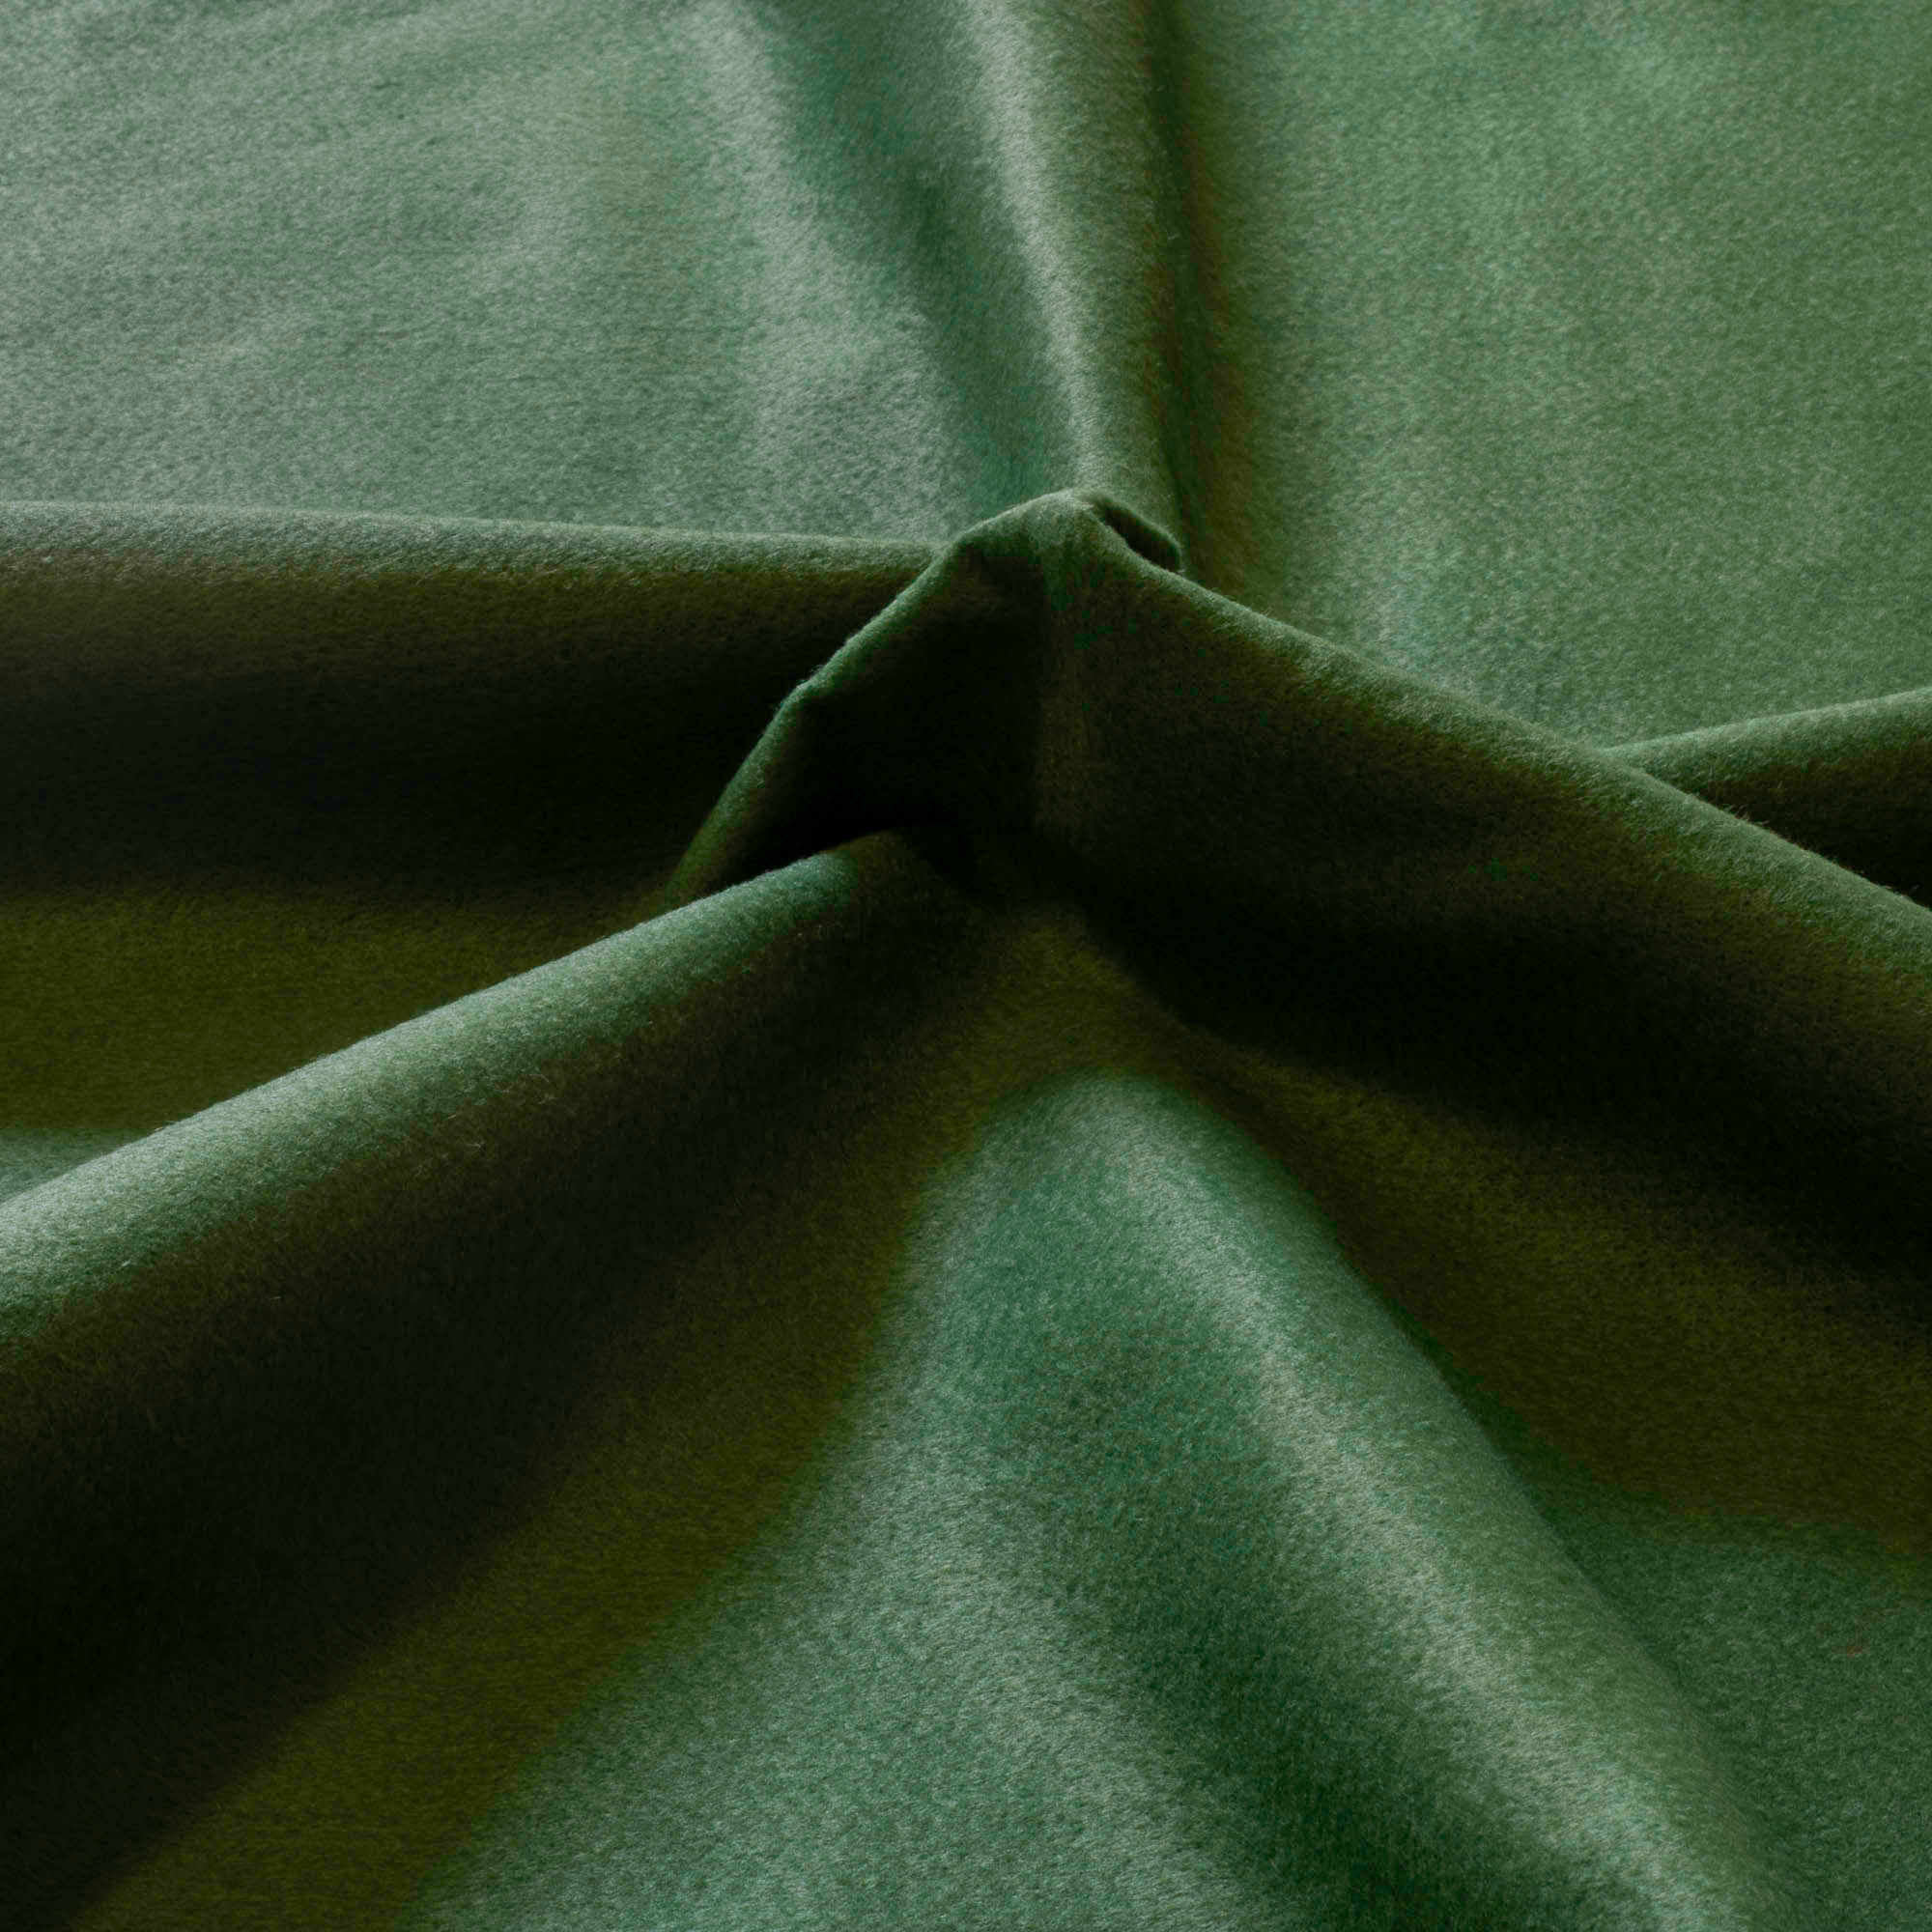 Tecido Feltro Verde 100% Poliester 1,40 Mt Largura